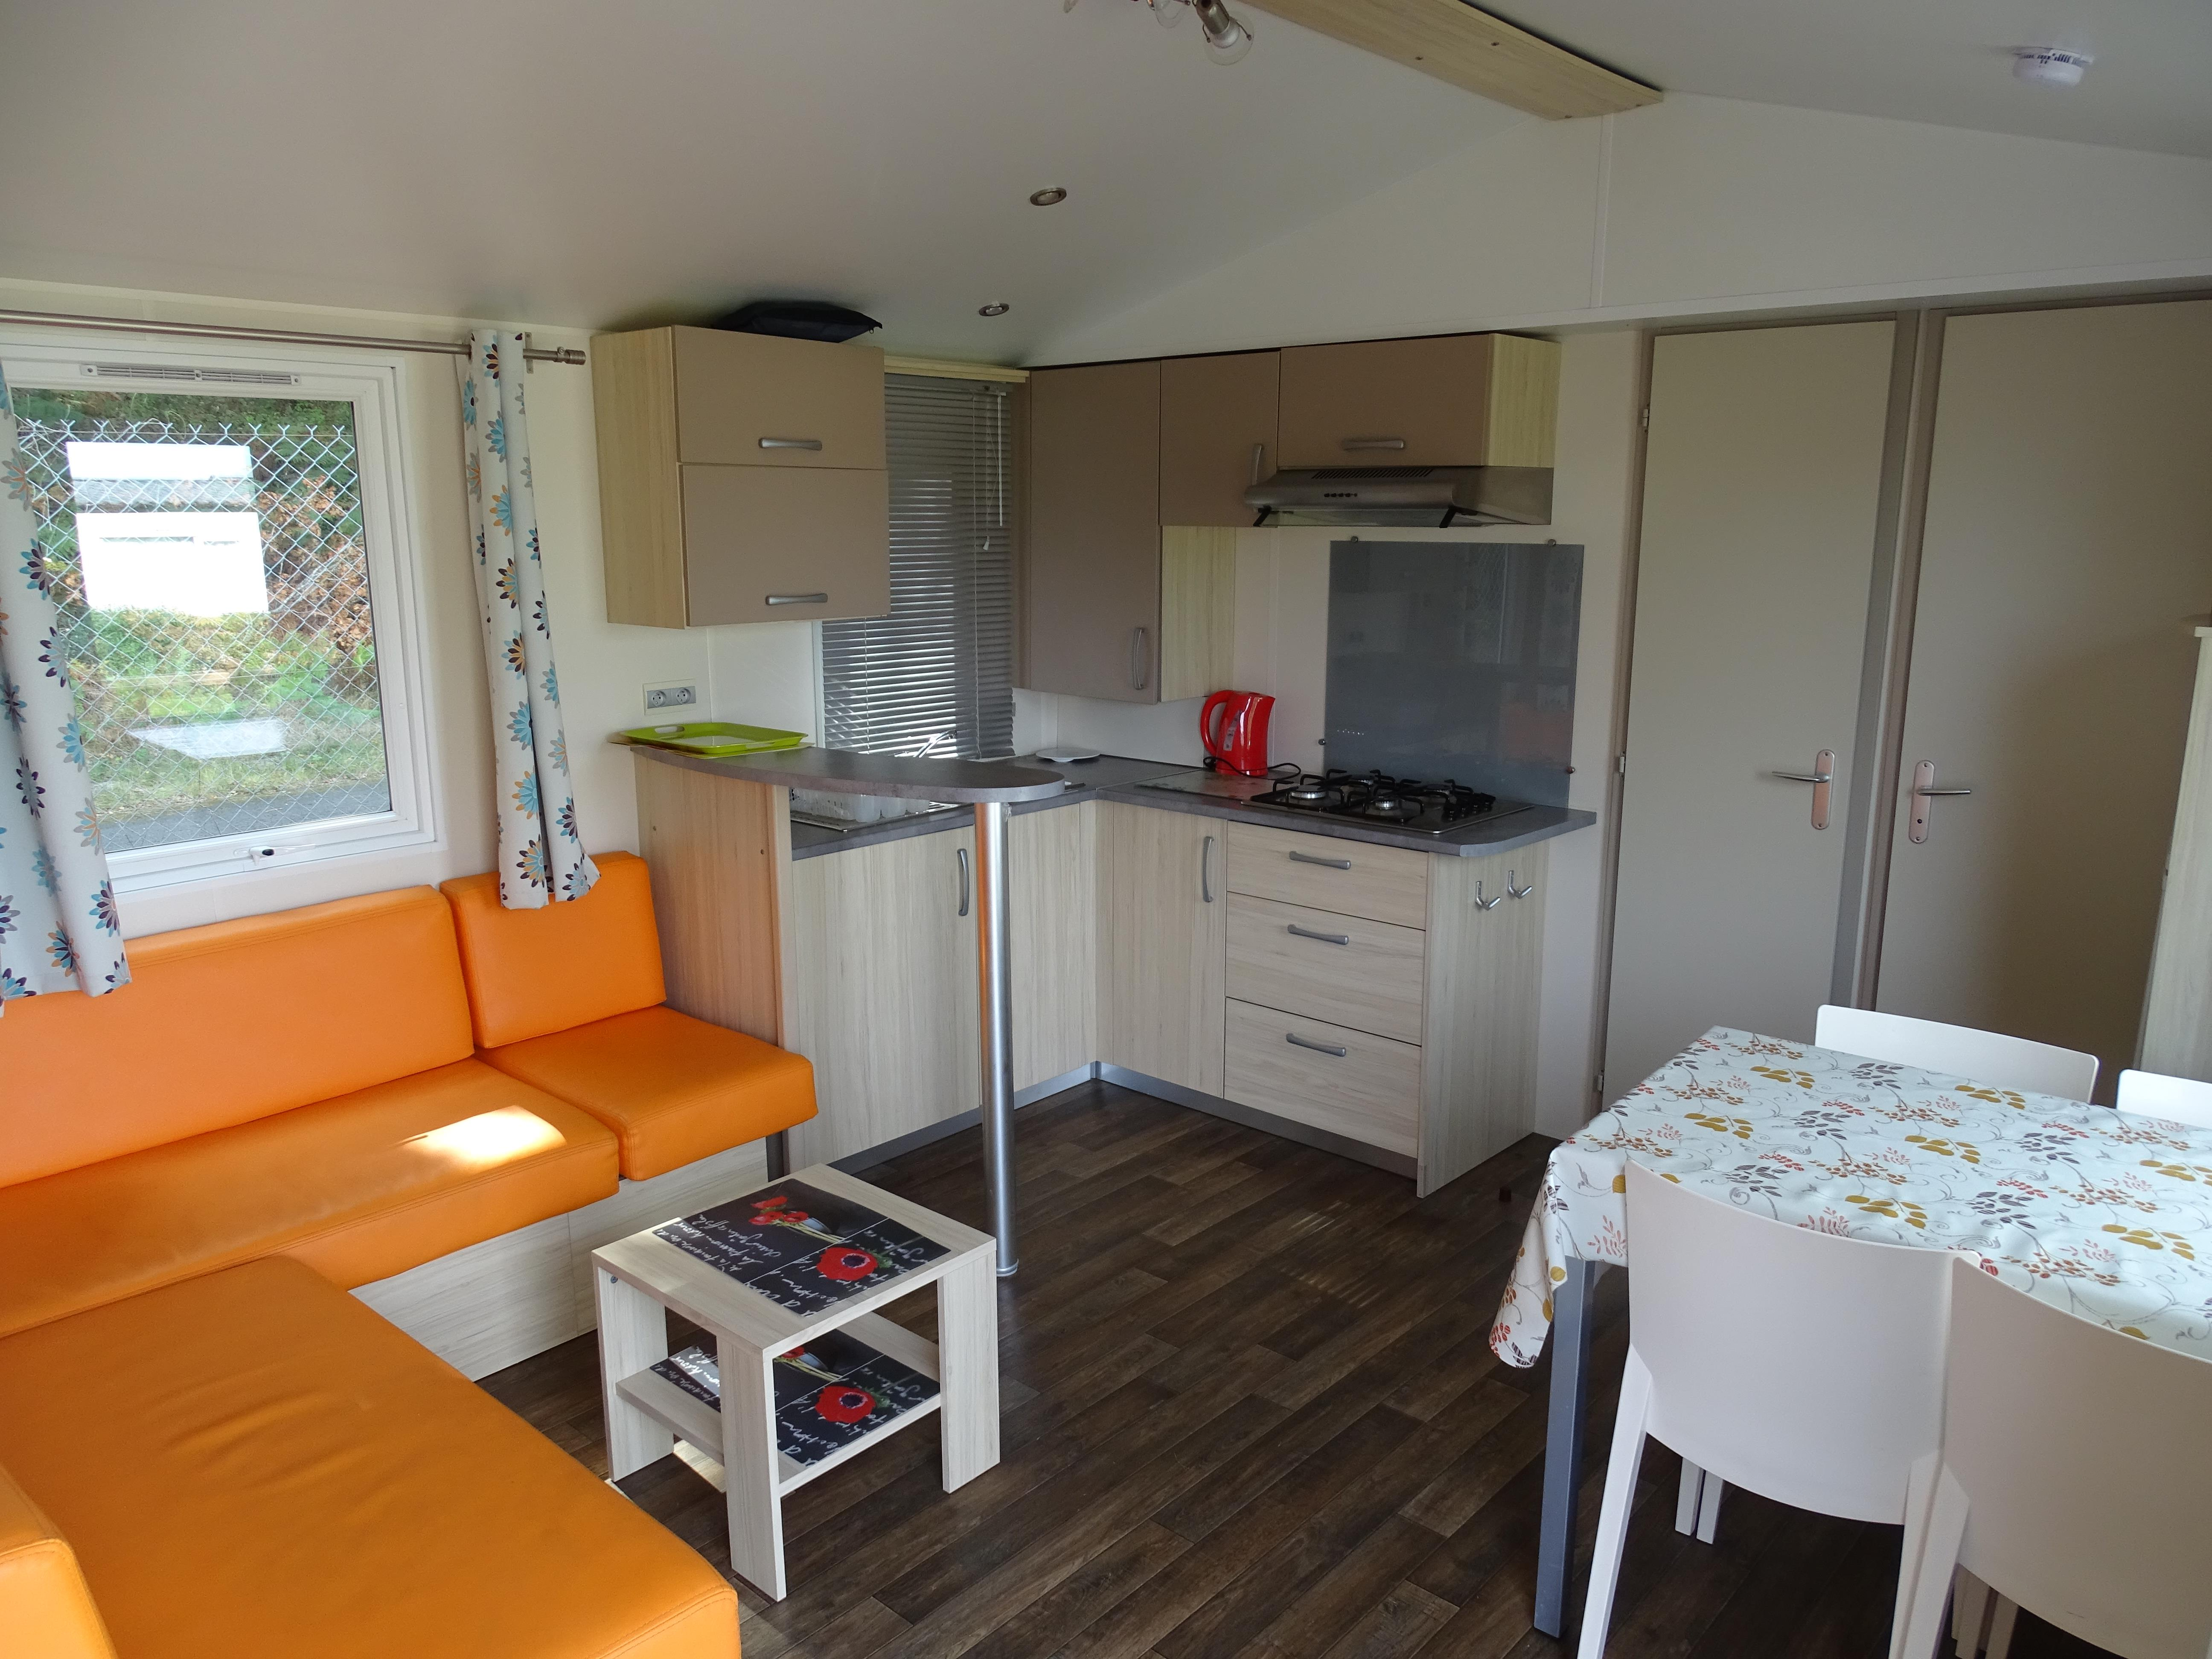 Location - Mobilhome Super Titania Confort - 2 Chambres - - Camping Le Logis du Breuil